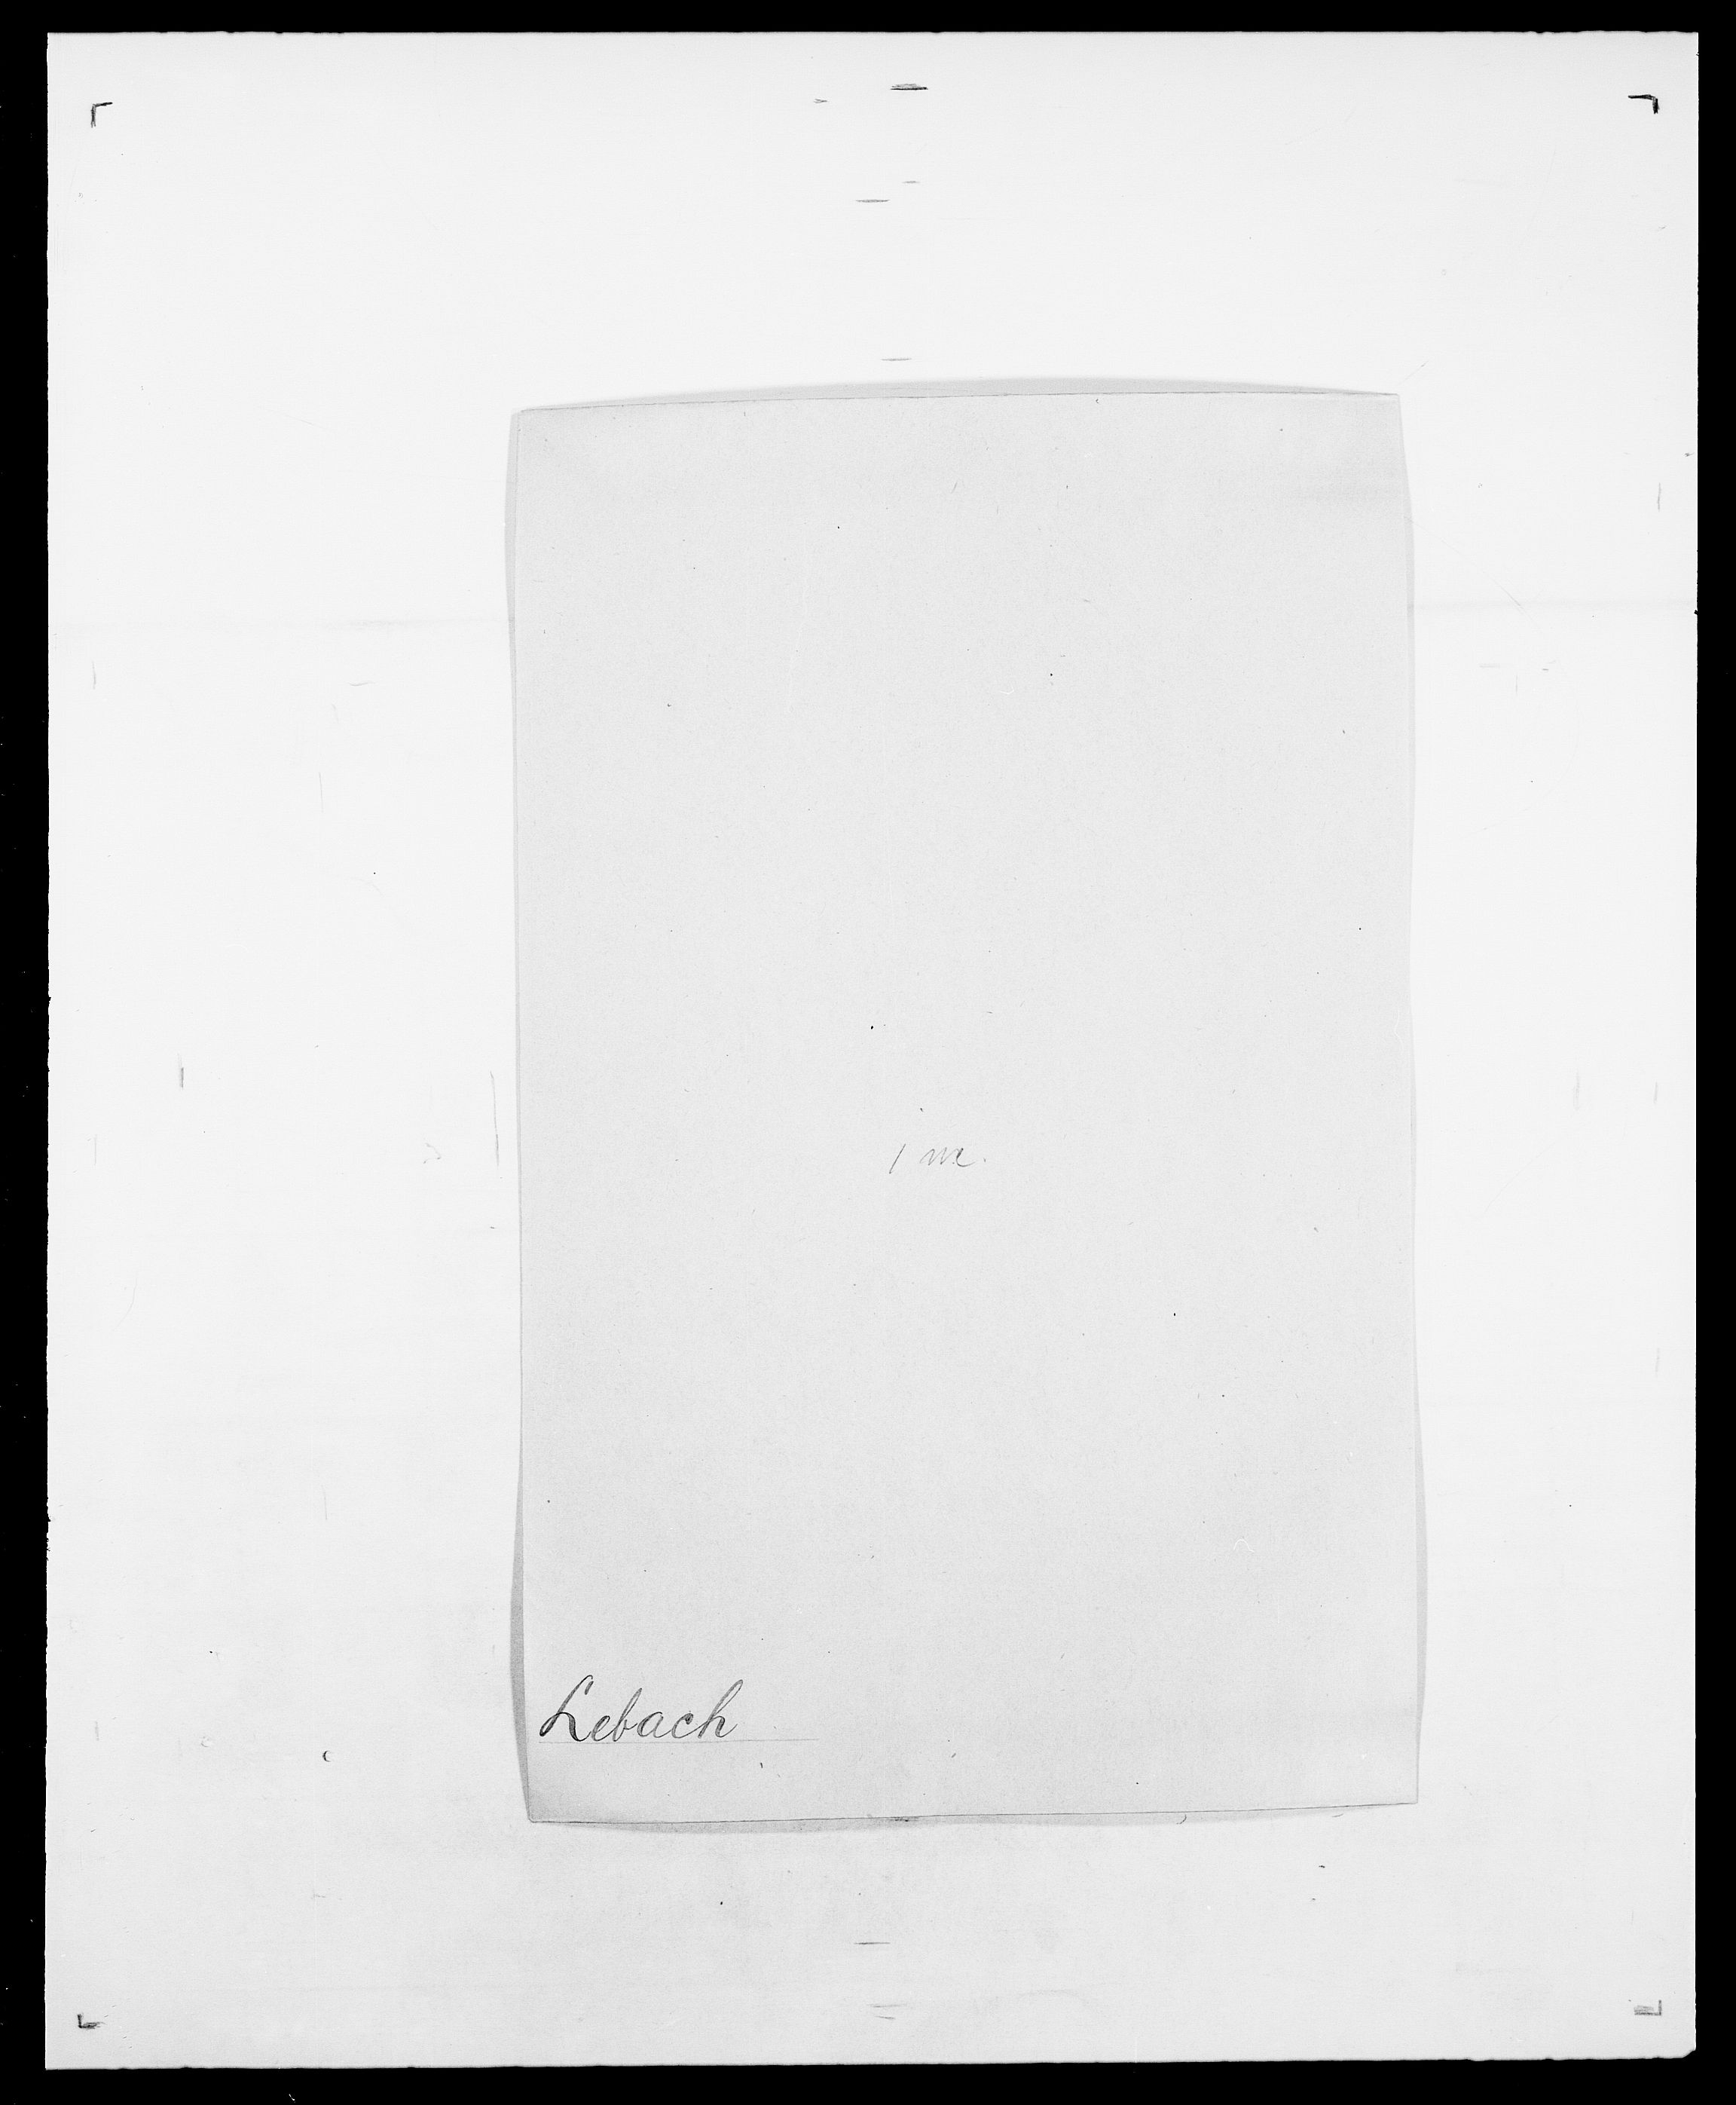 SAO, Delgobe, Charles Antoine - samling, D/Da/L0023: Lau - Lirvyn, s. 48